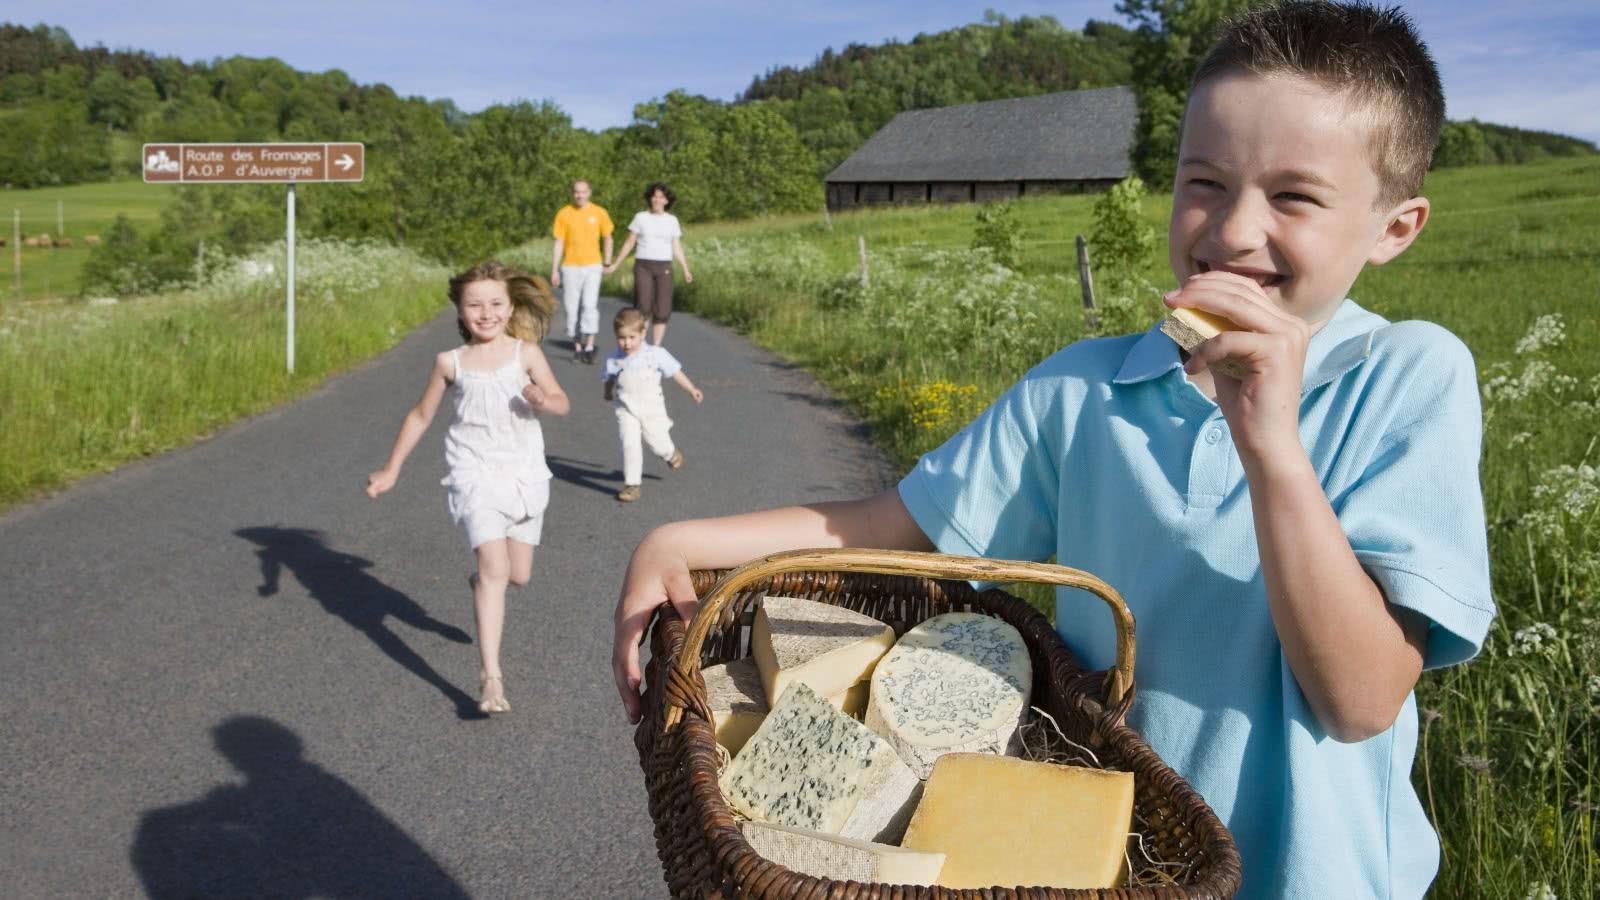 The P.D.O. cheese tour